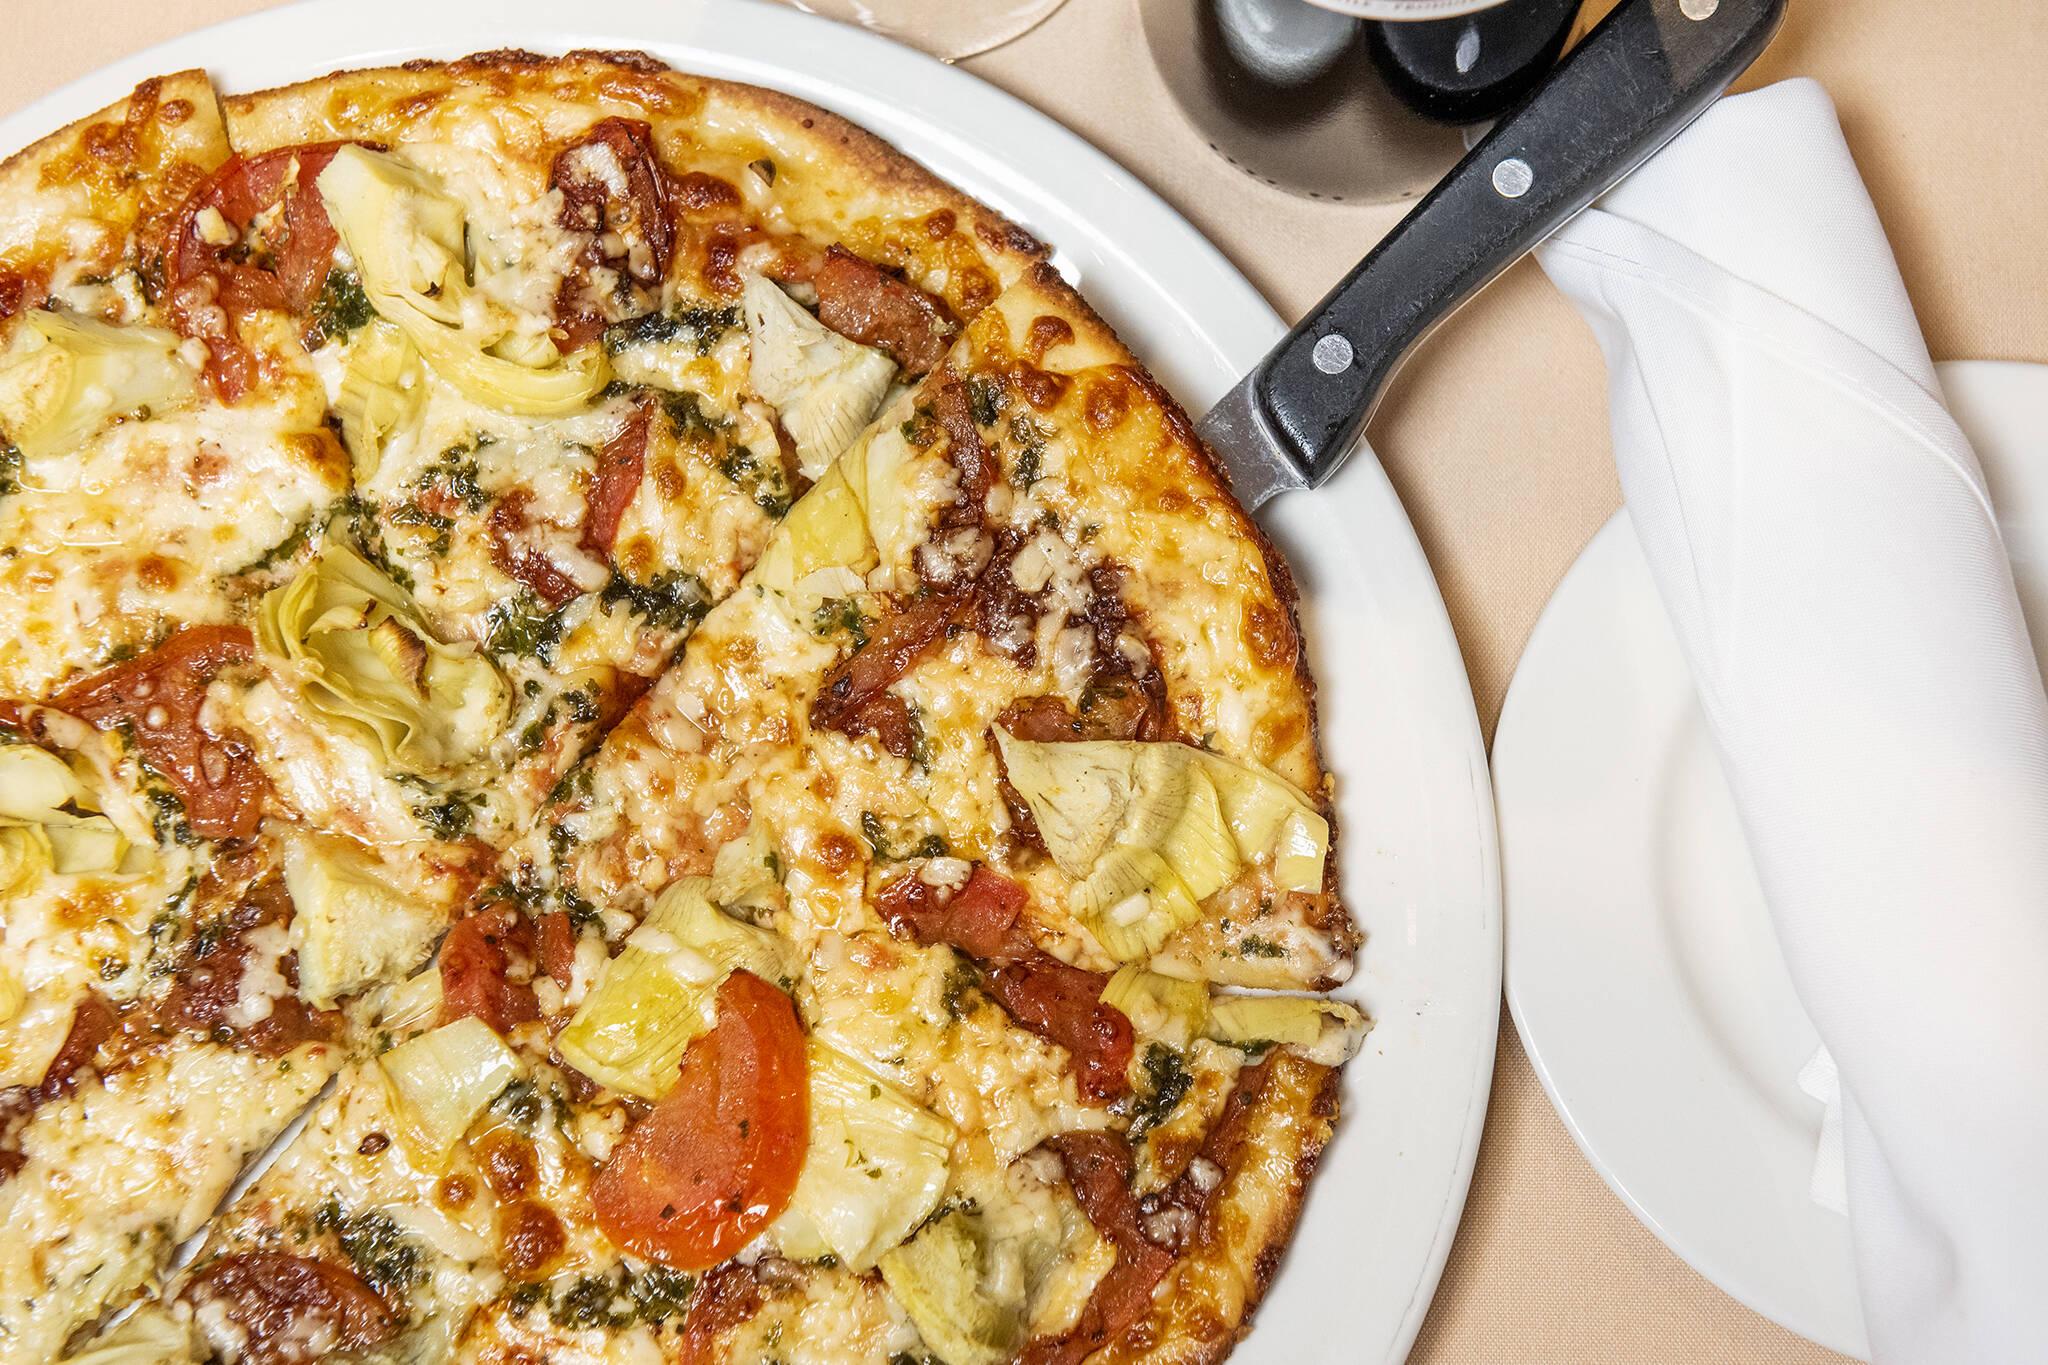 toronto vesuvio pizza